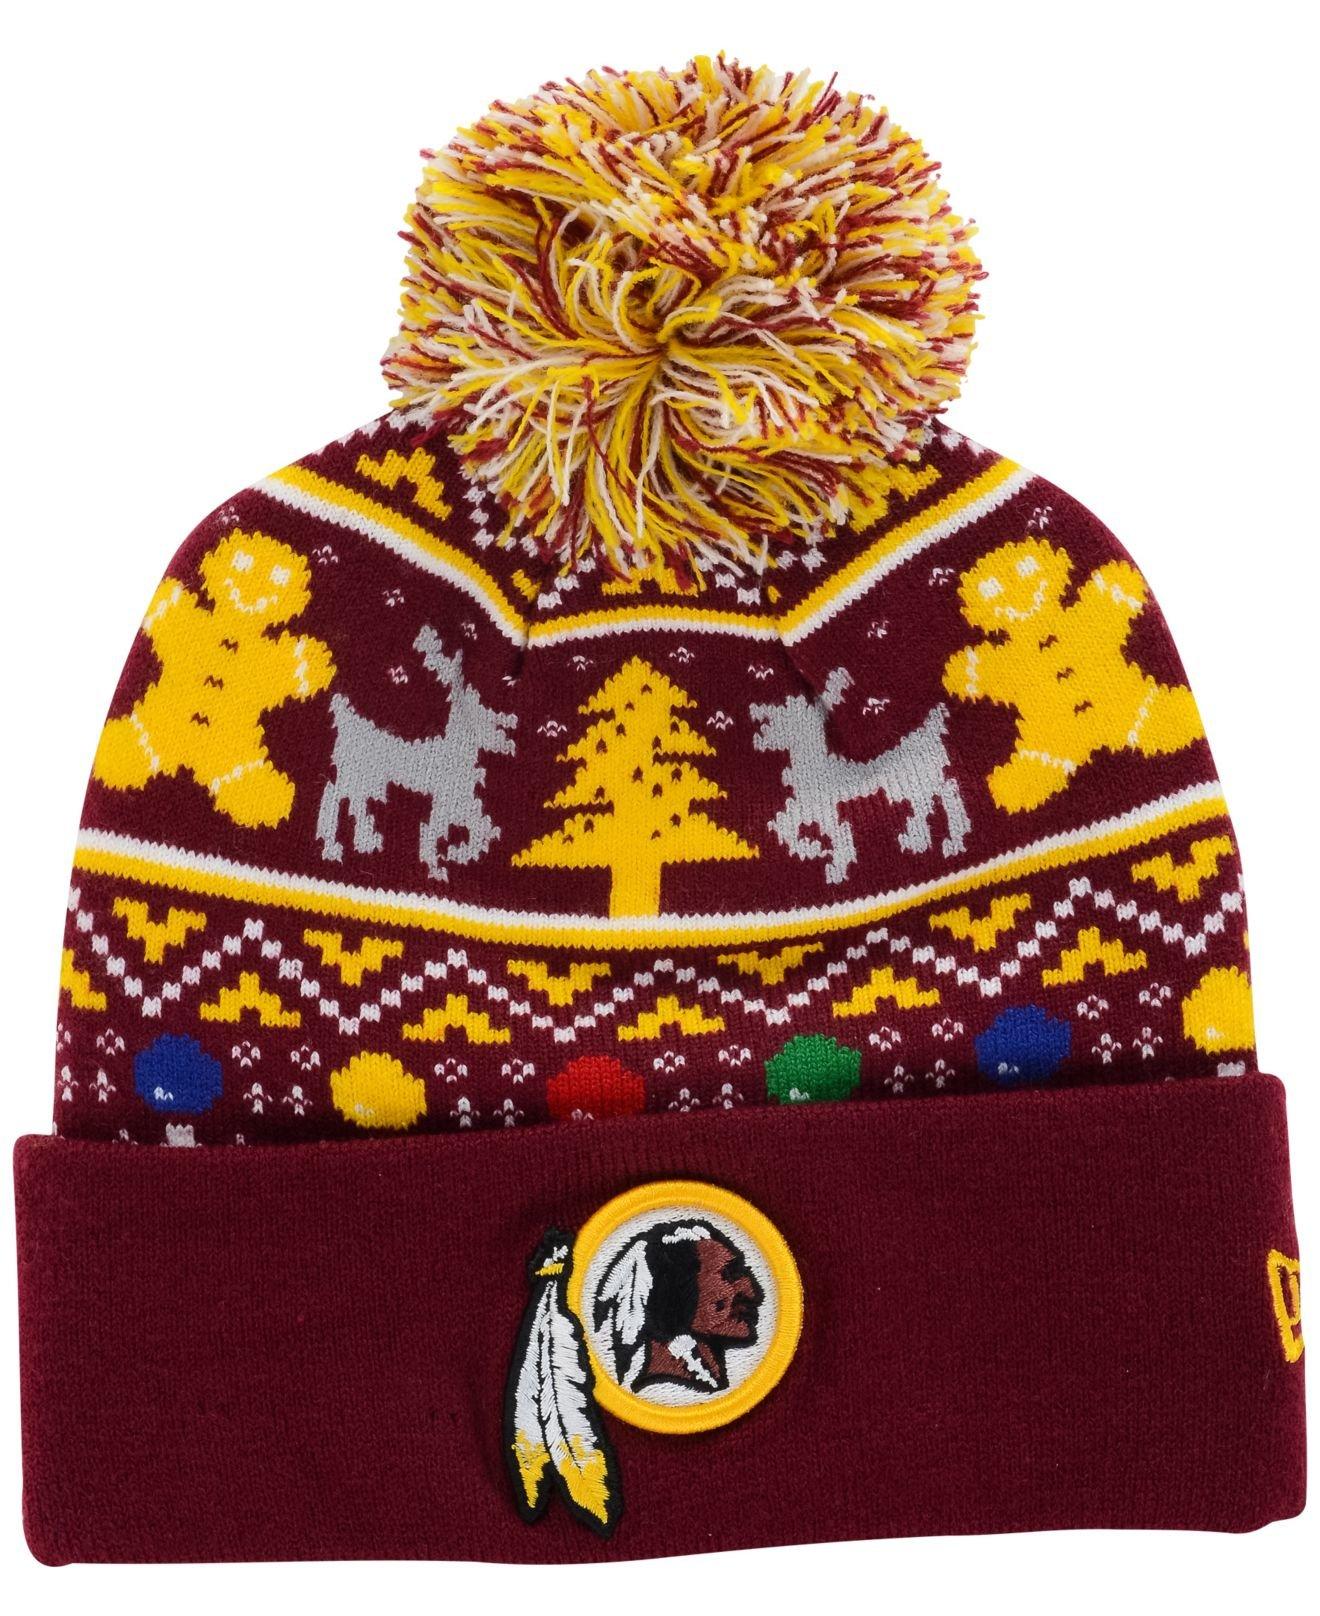 check out 13e82 7bb82 KTZ Purple Washington Redskins Christmas Sweater Pom Knit Hat for men